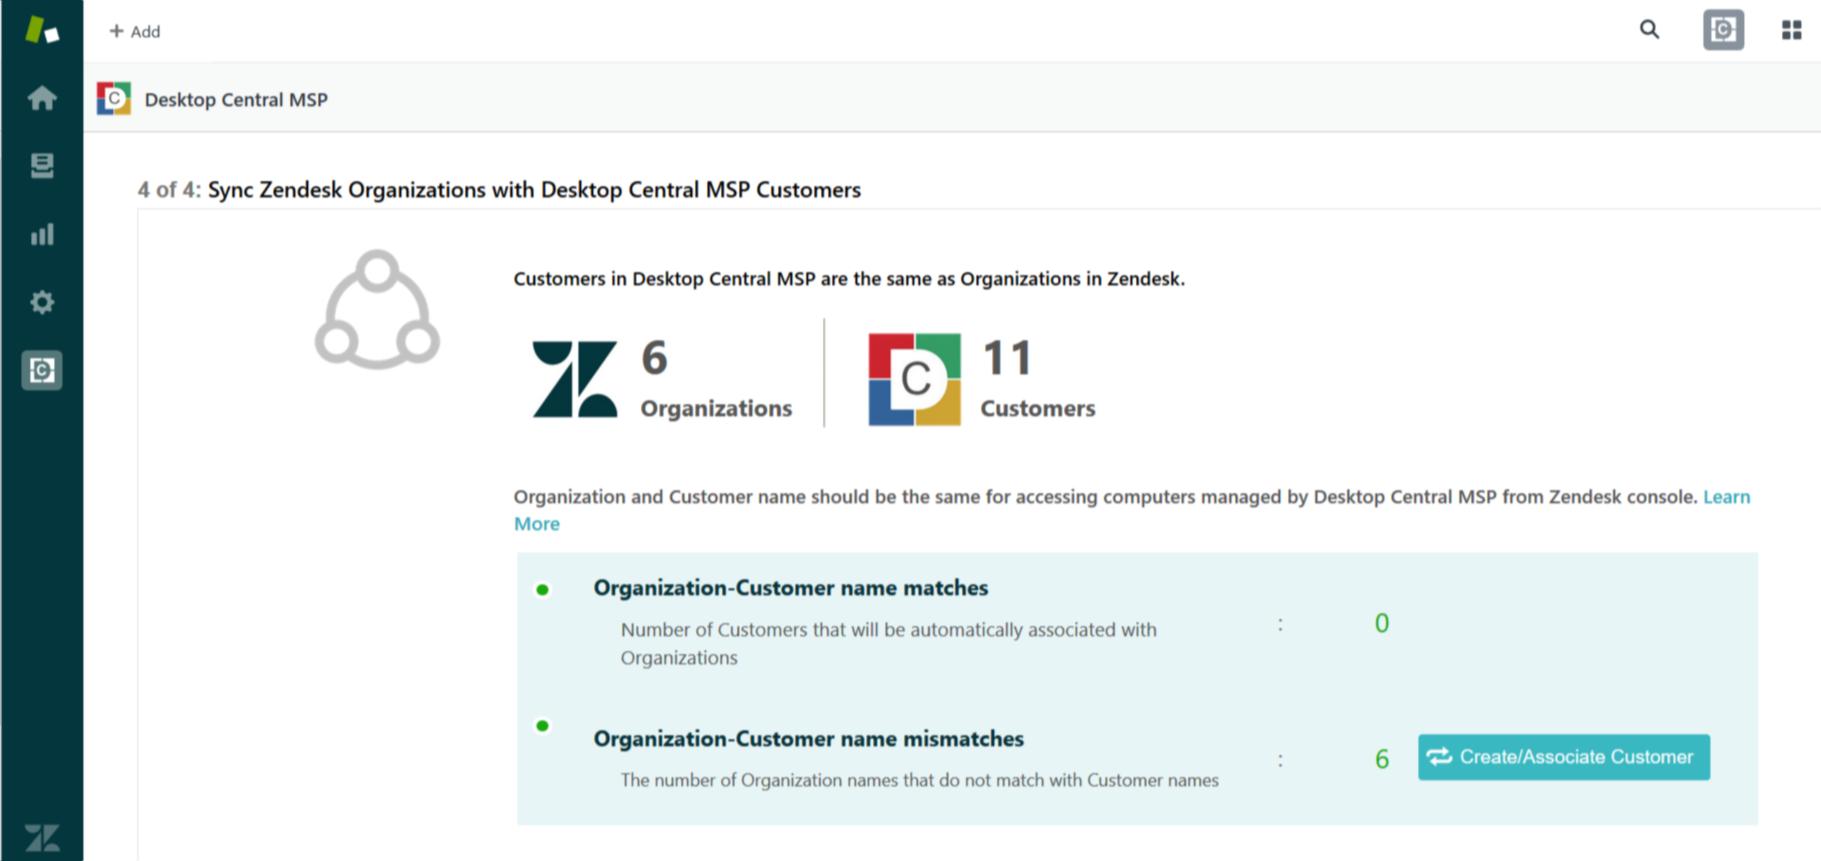 Customer-Organization Mapping